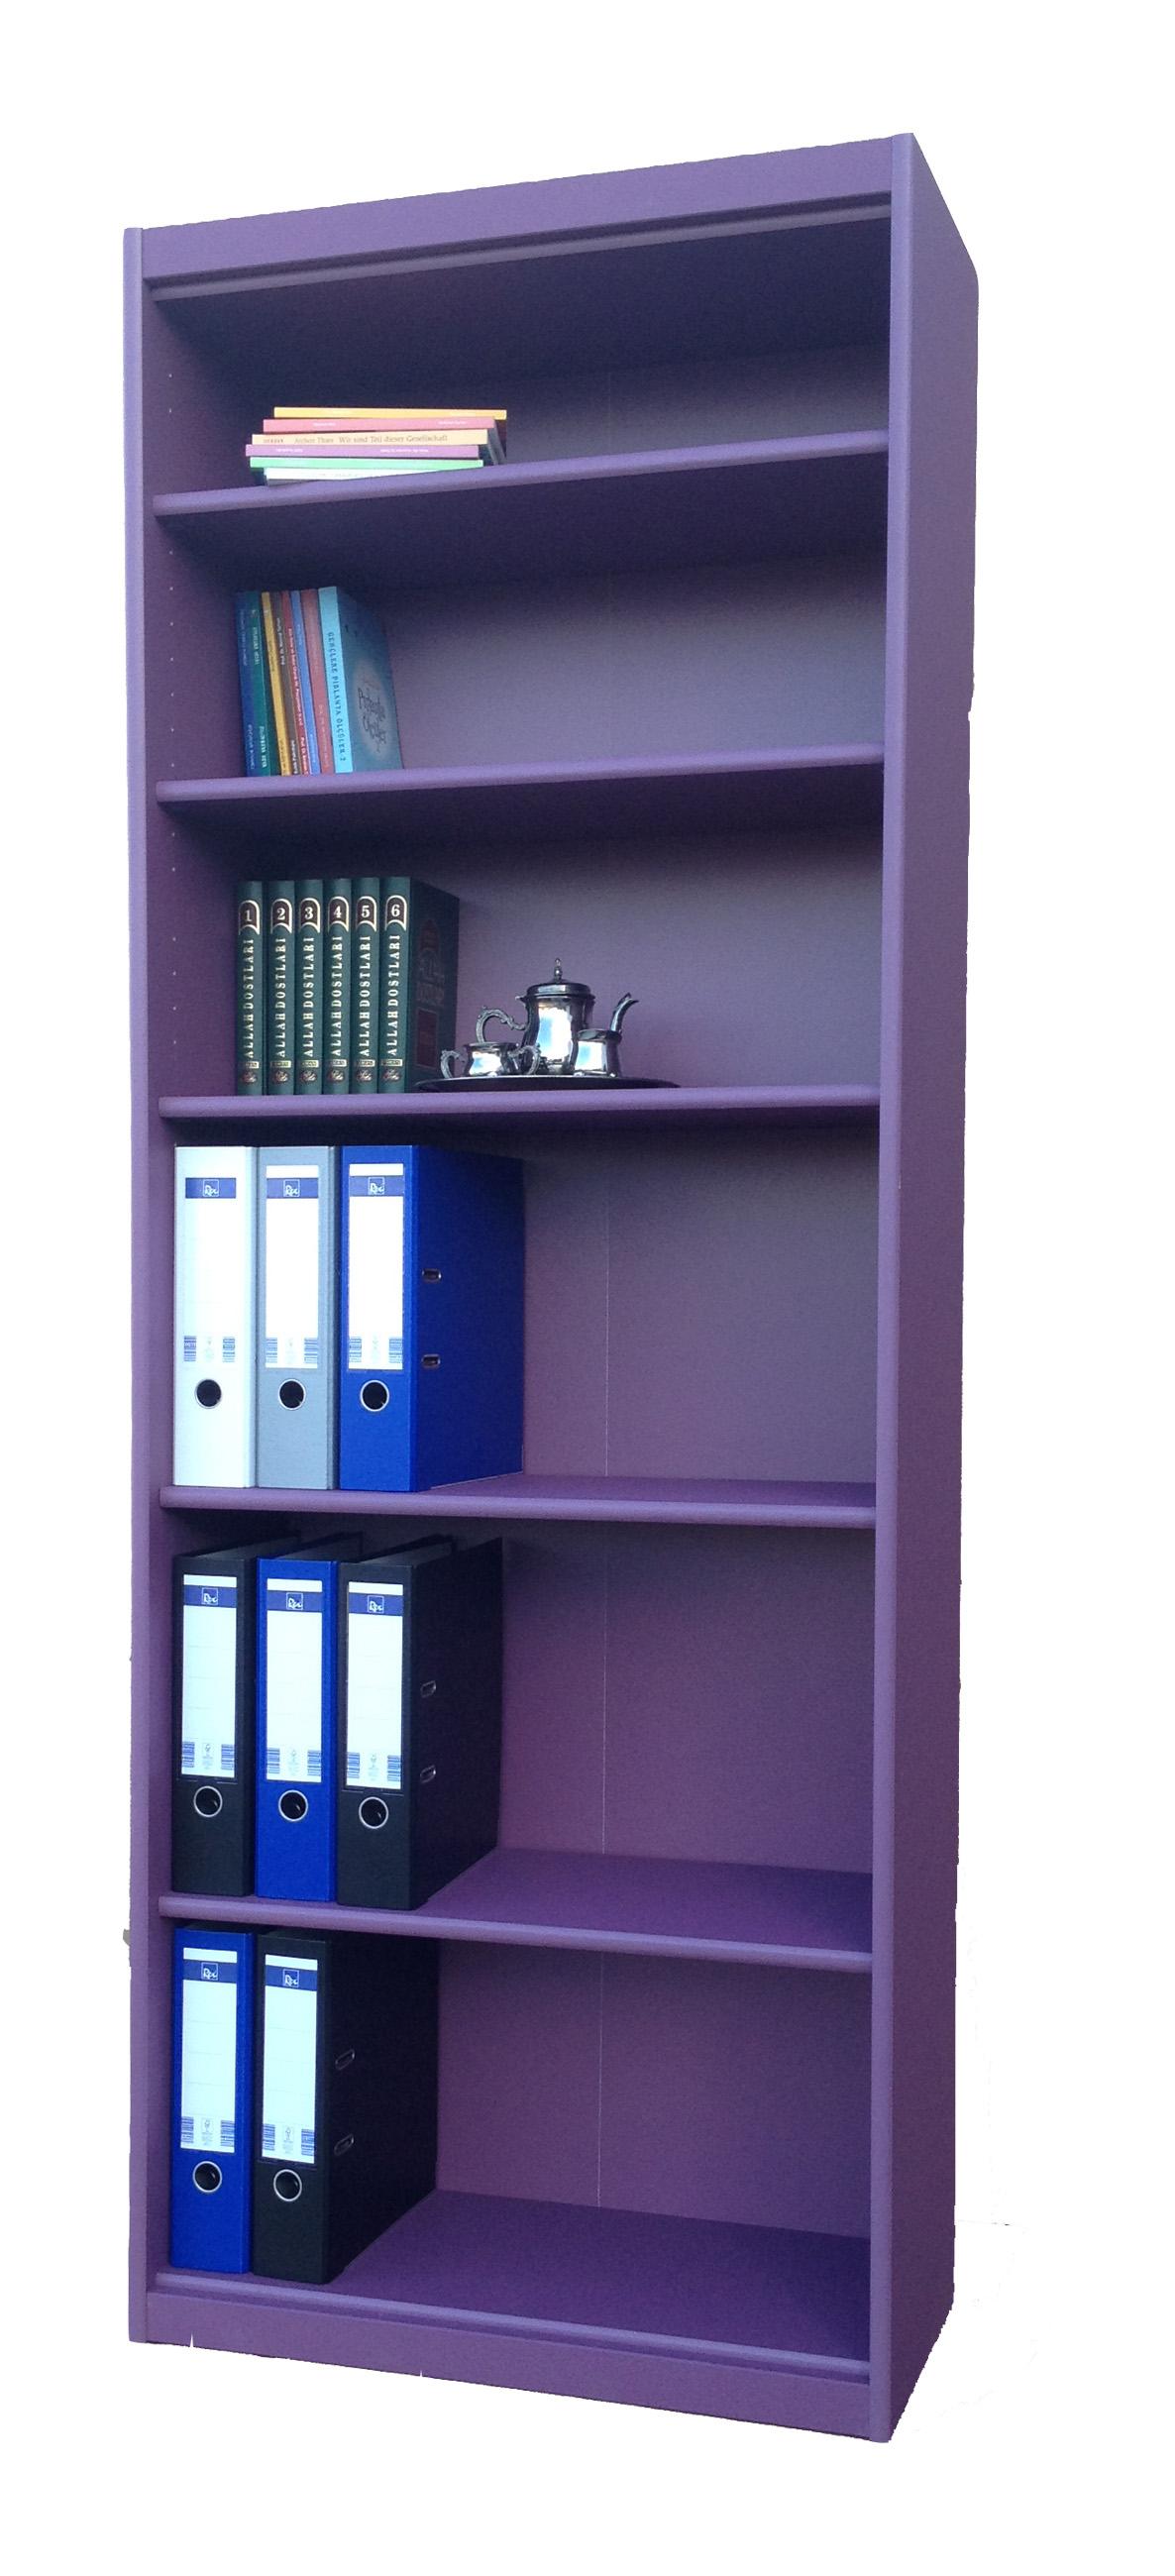 b cherregal aktenregal regal b roregal b rom bel ordner anthrazit lila gelb ebay. Black Bedroom Furniture Sets. Home Design Ideas